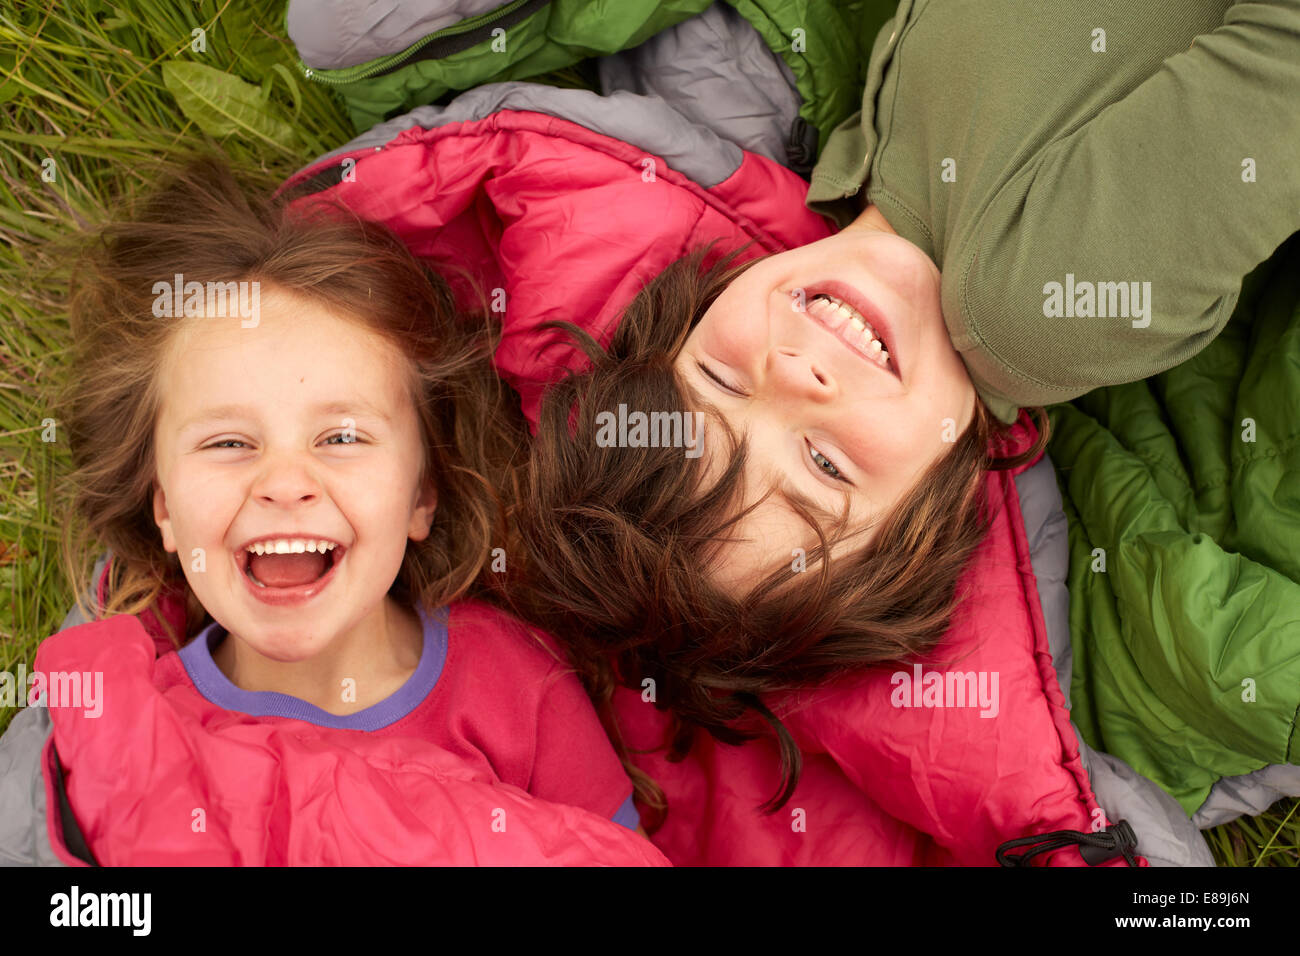 Lachende Kinder Schlafsäcke Handauflegen Stockbild